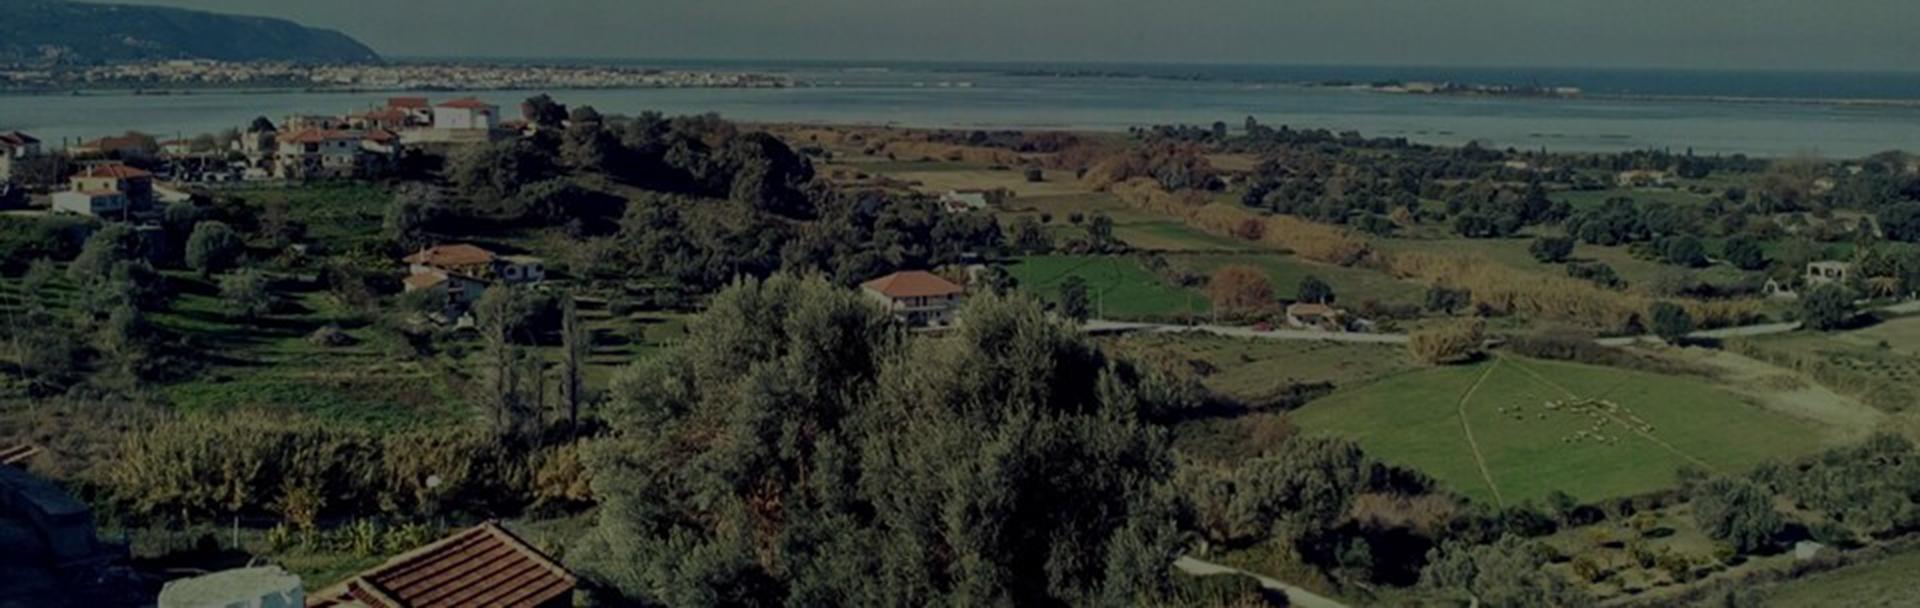 Roggaki Villas